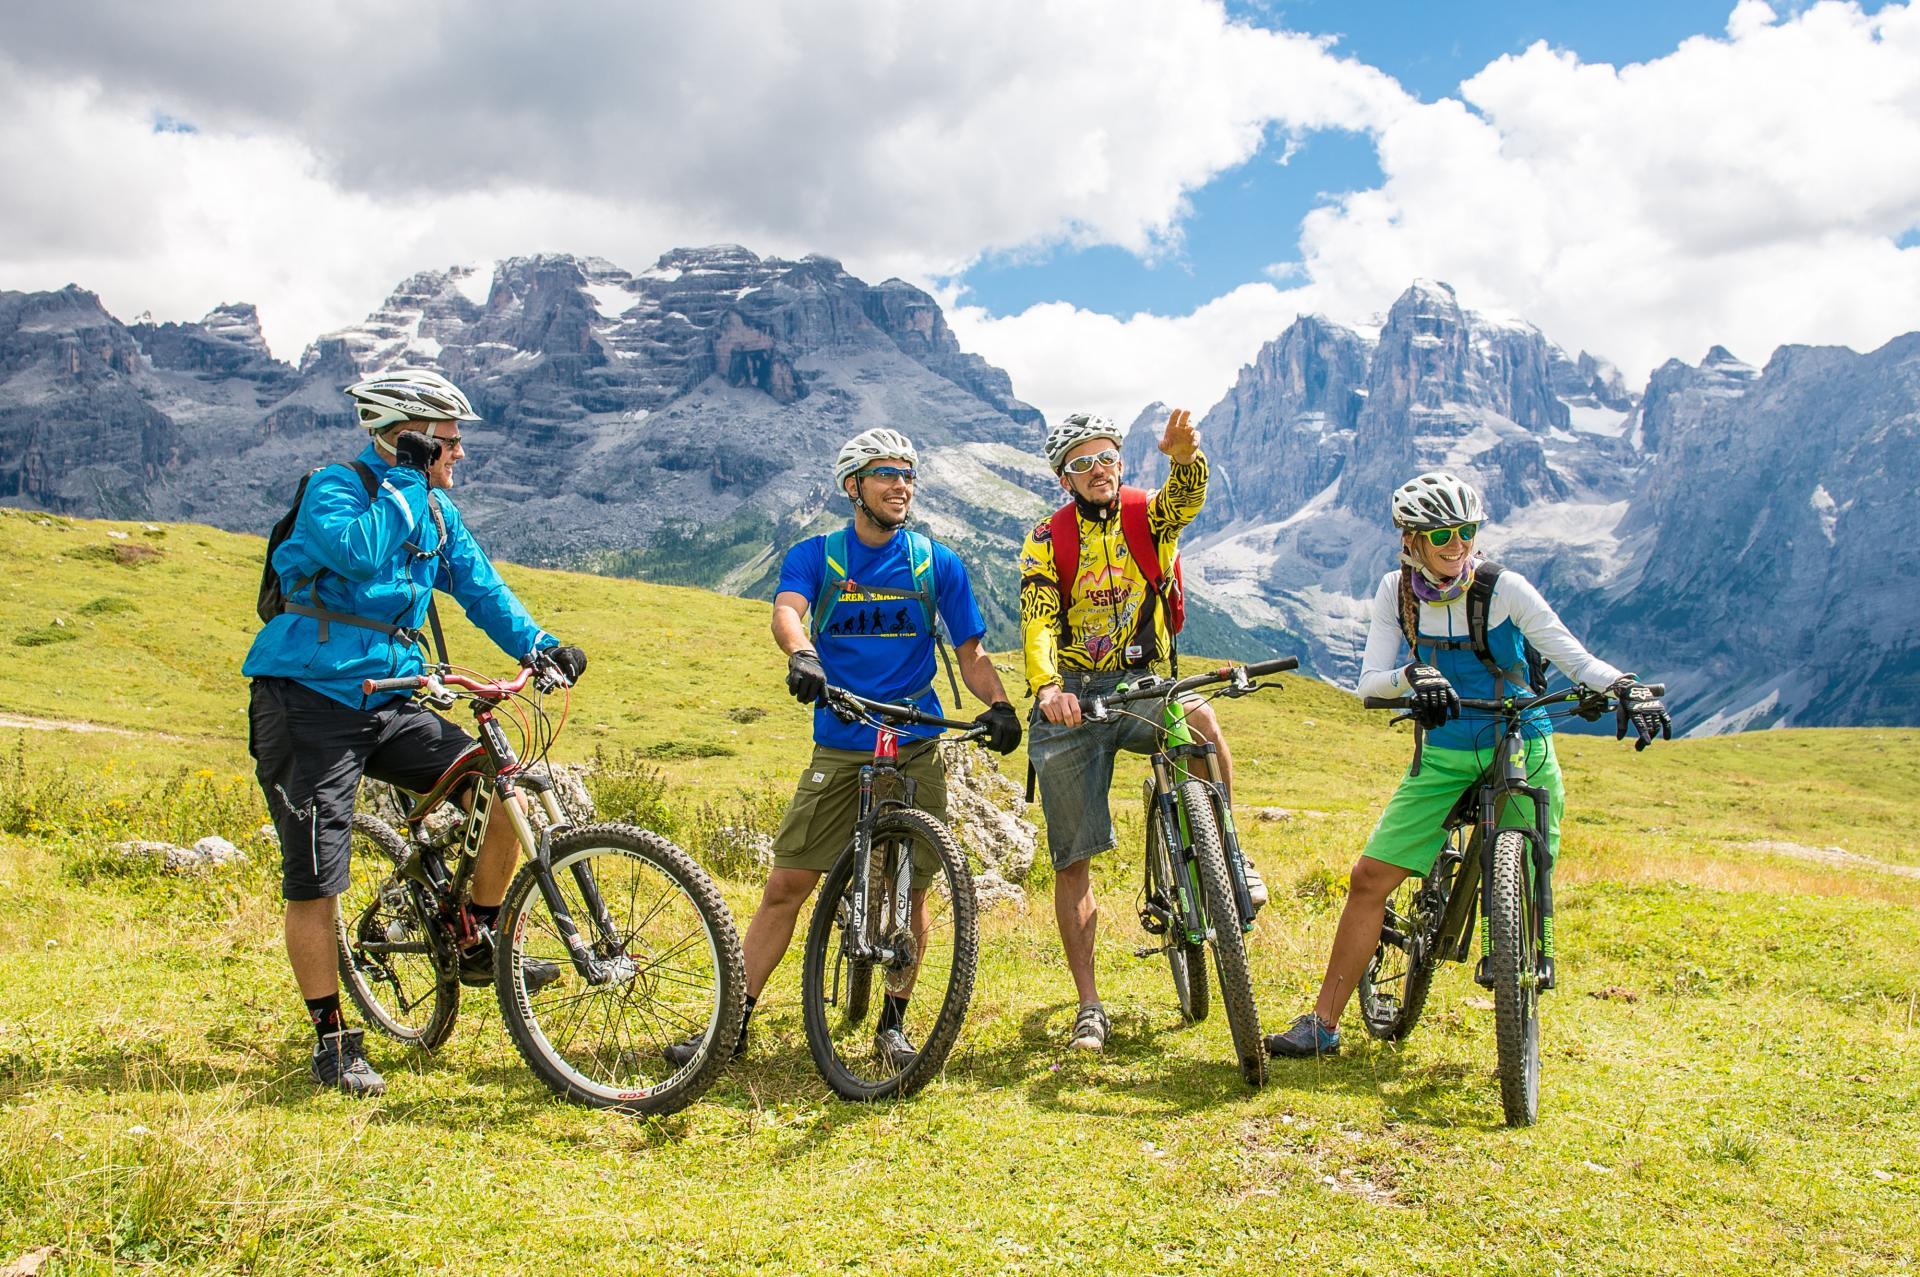 estate-campiglio_pinzolo-rendena-bike-area-ph_bisti.jpg